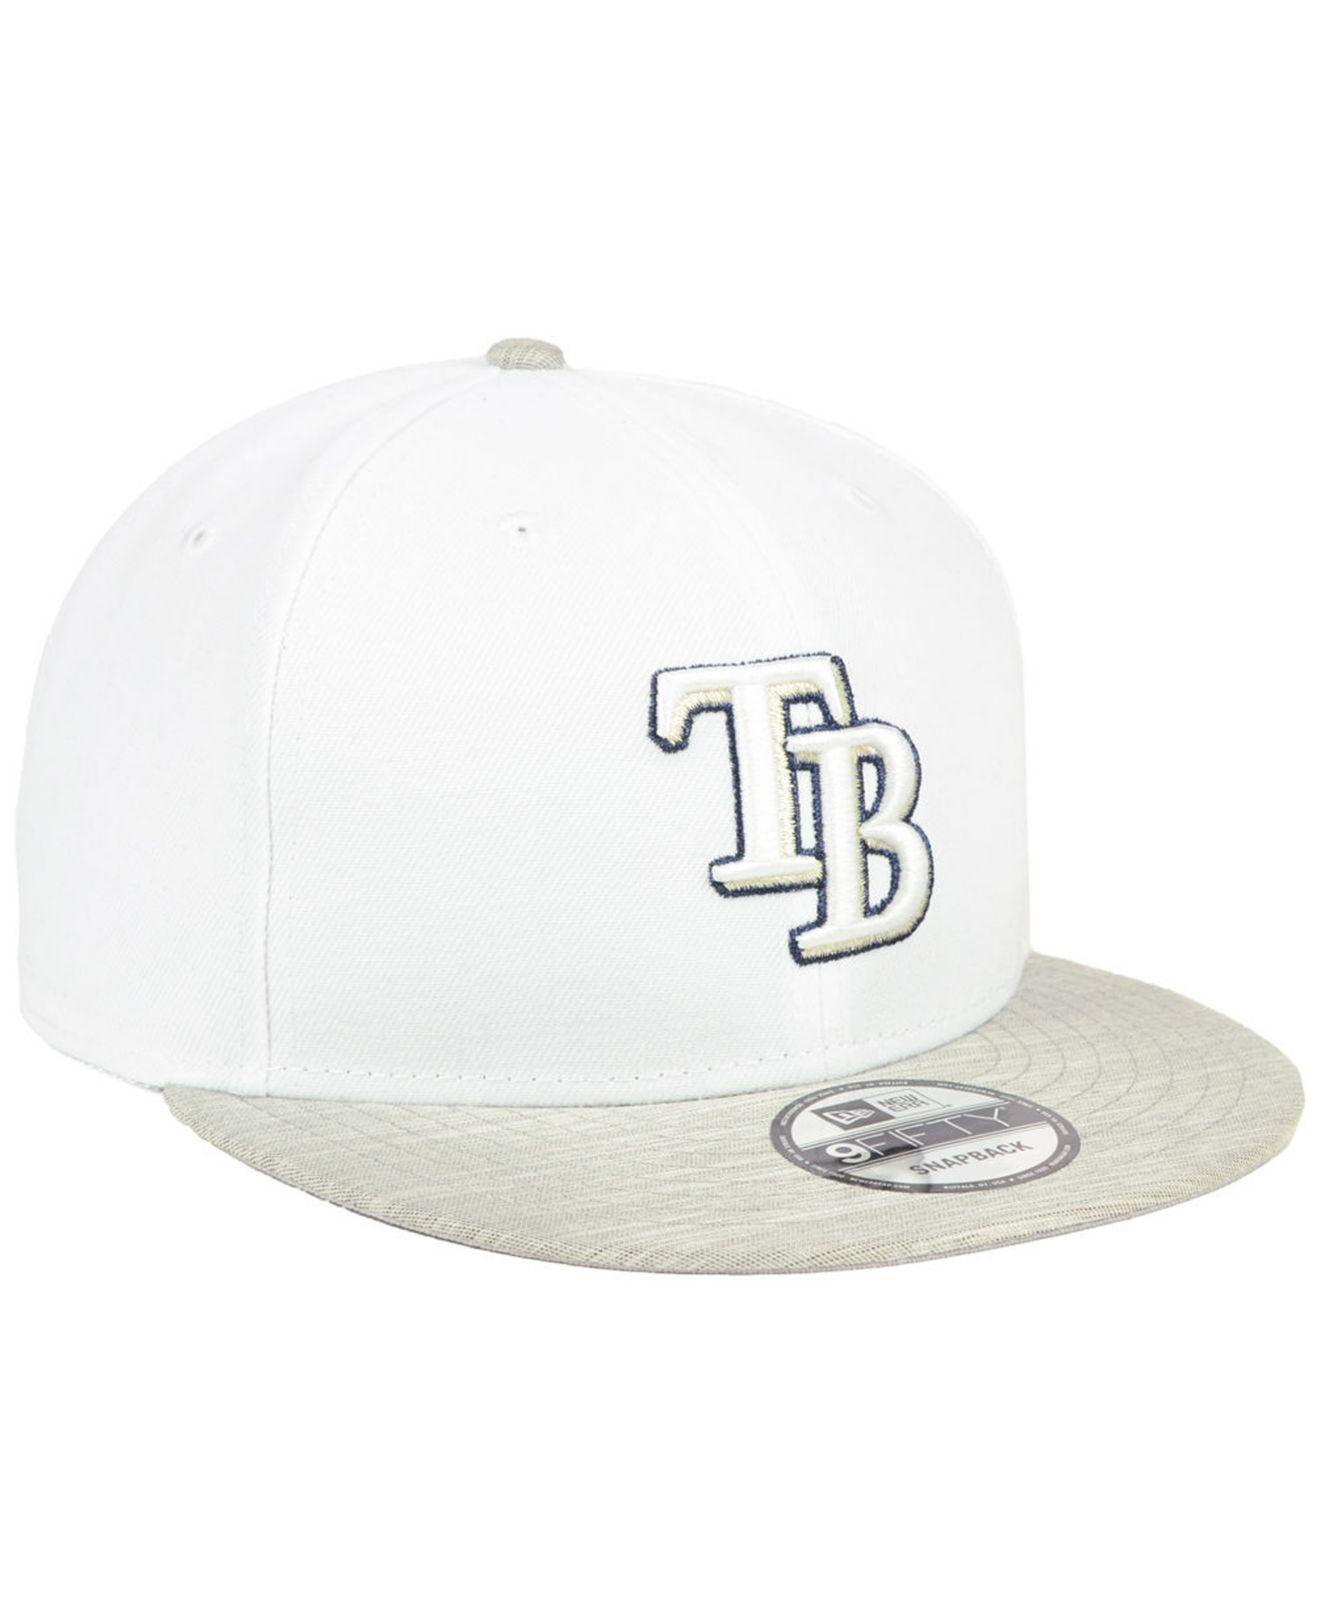 buy online 550c5 1e9d0 ... aliexpress tampa bay rays bright heather 9fifty snapback cap for men  lyst. view fullscreen d7f01